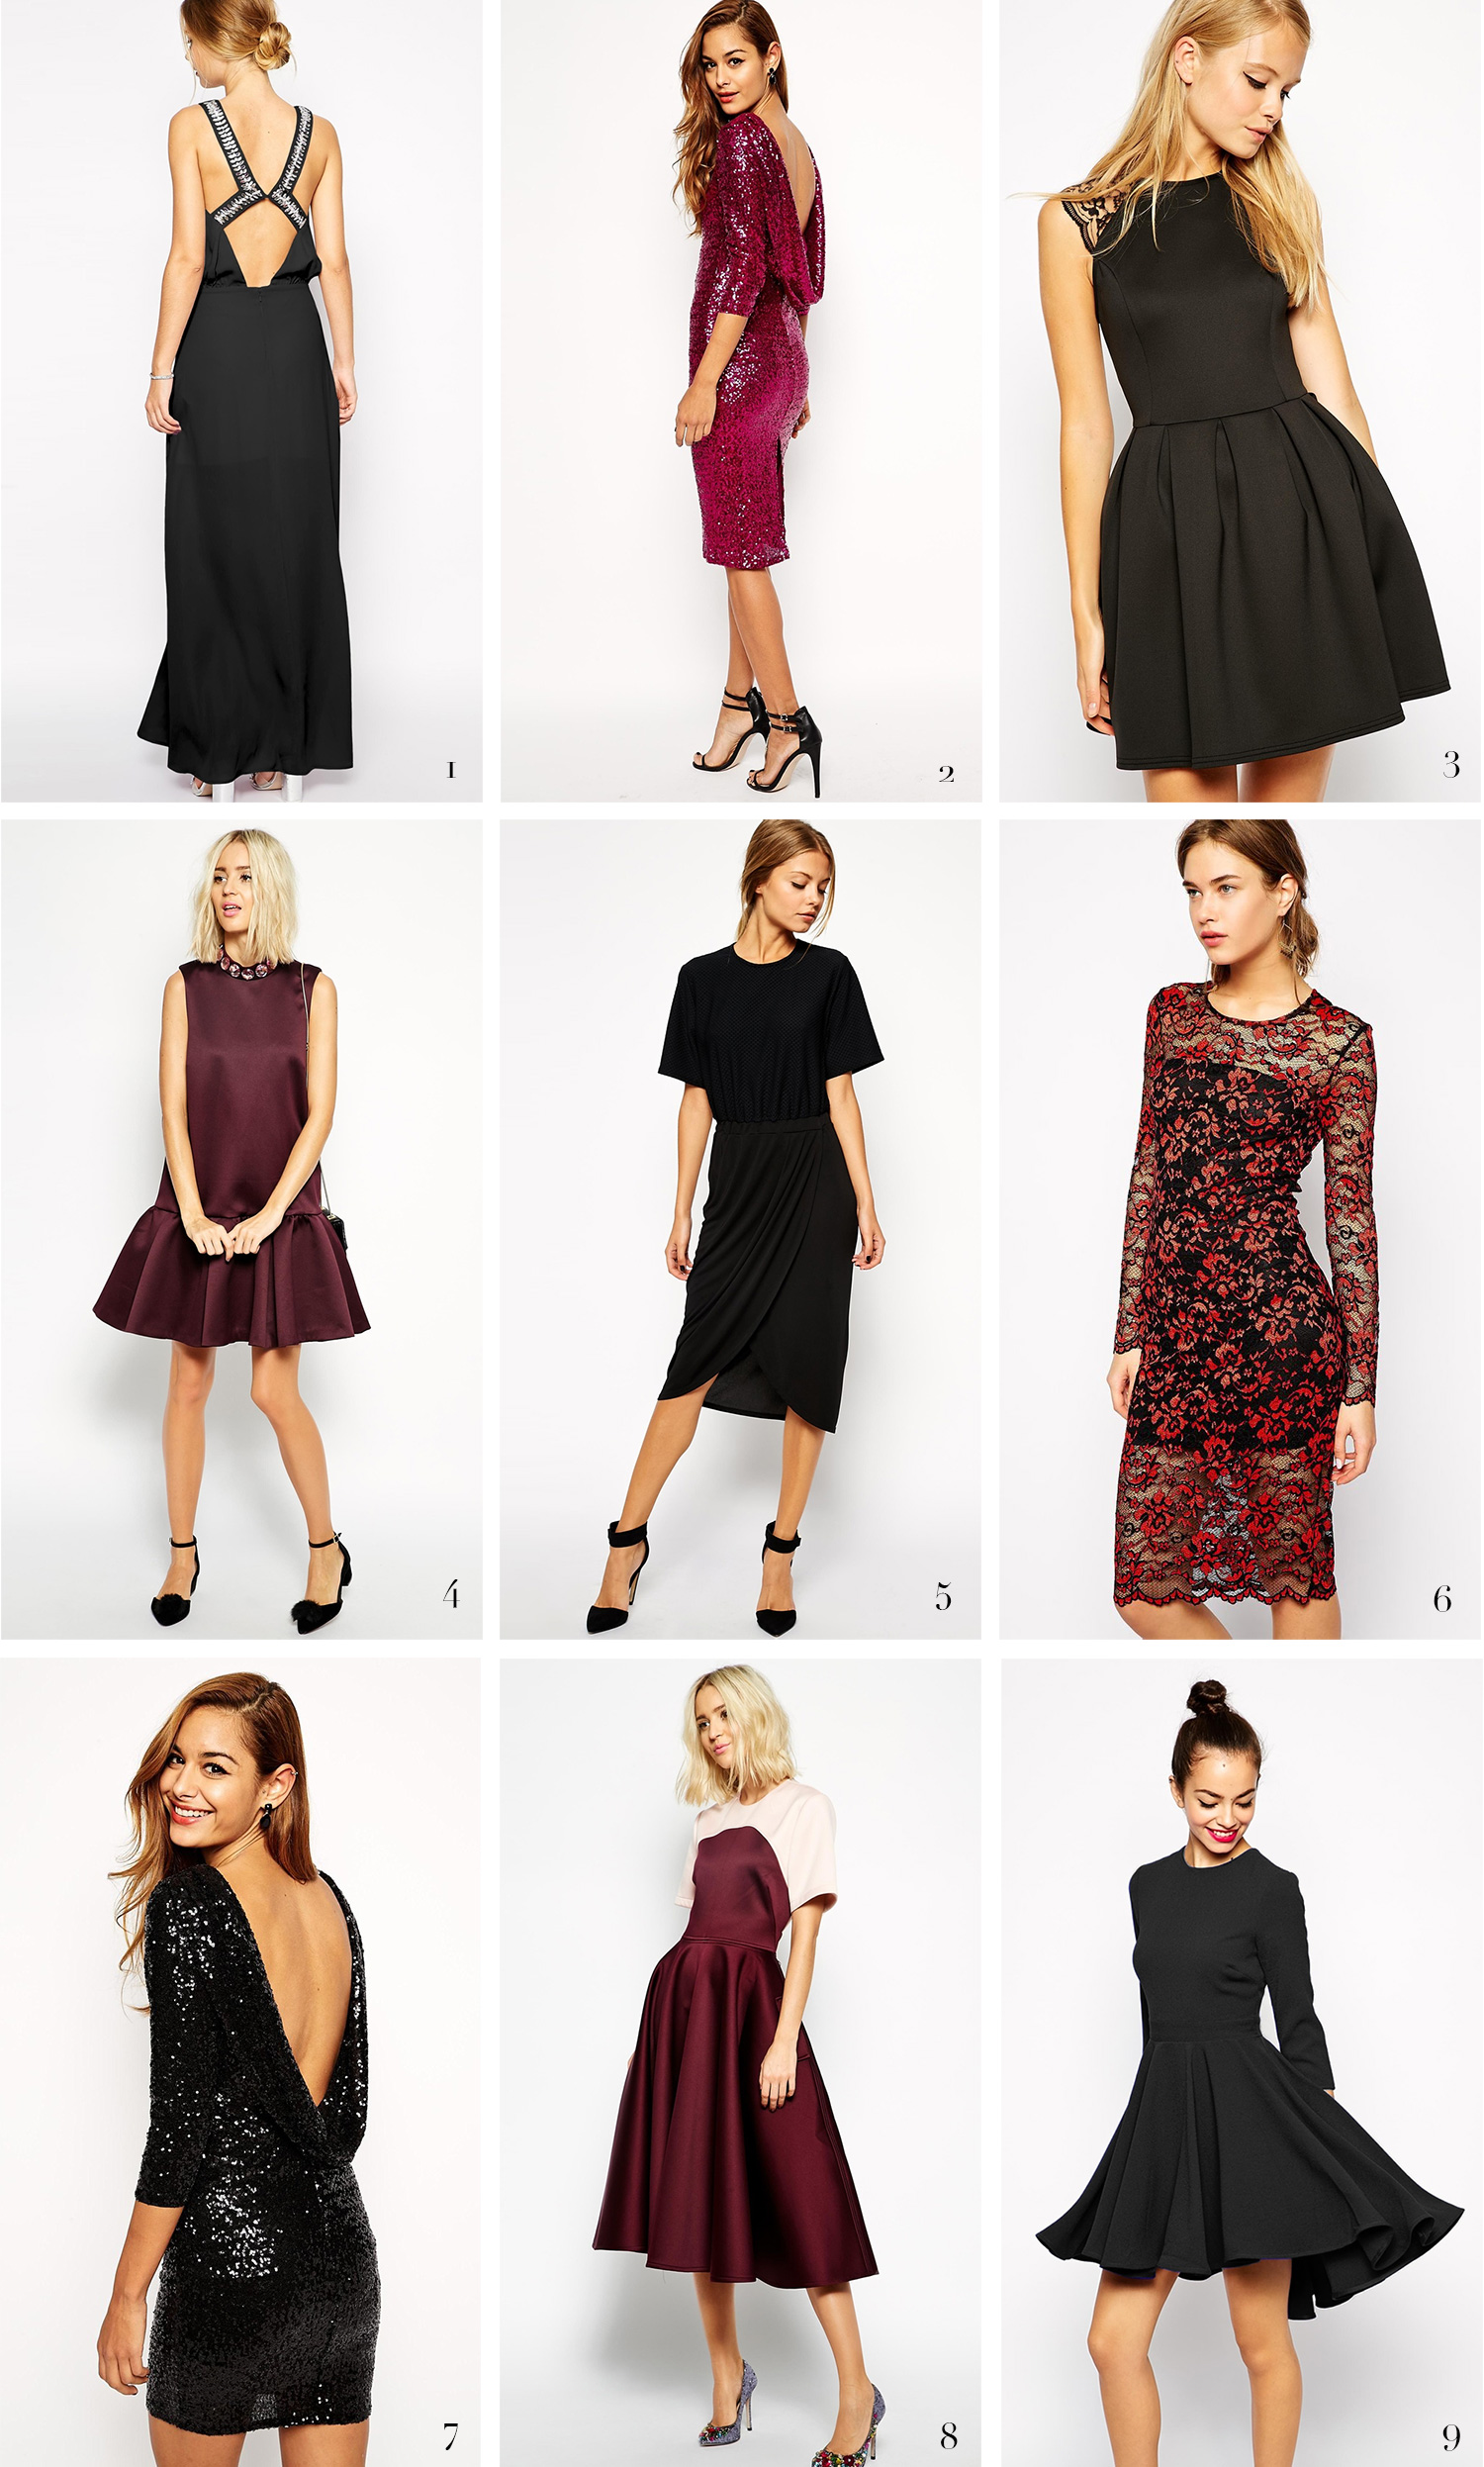 b24096f6f982 Party dresses - Christina Dueholm